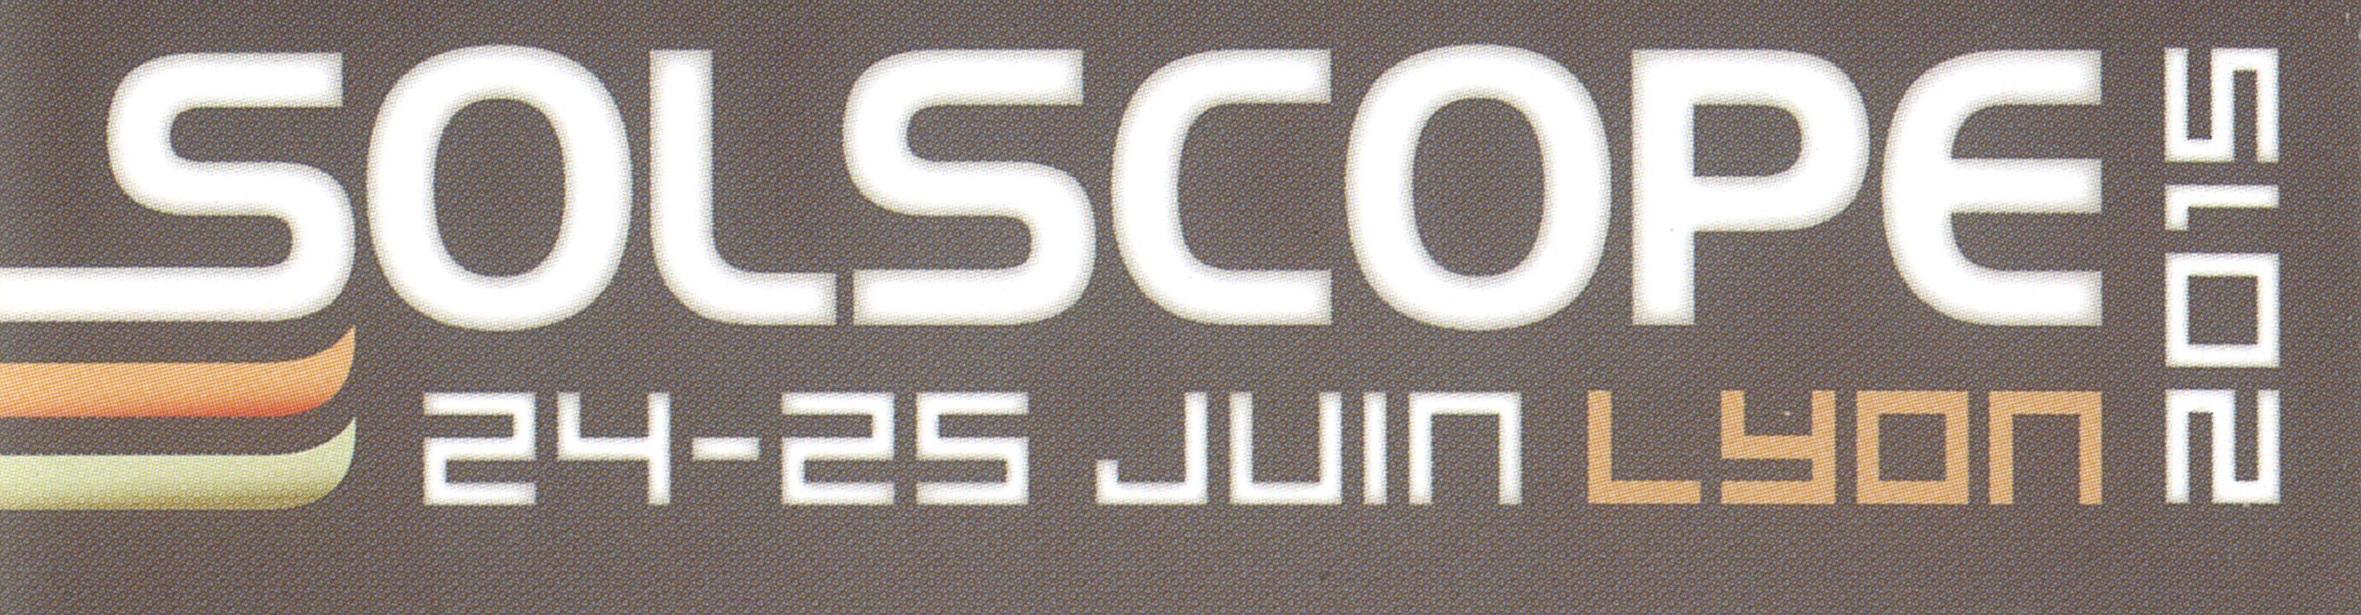 SOLSCOPE 2015